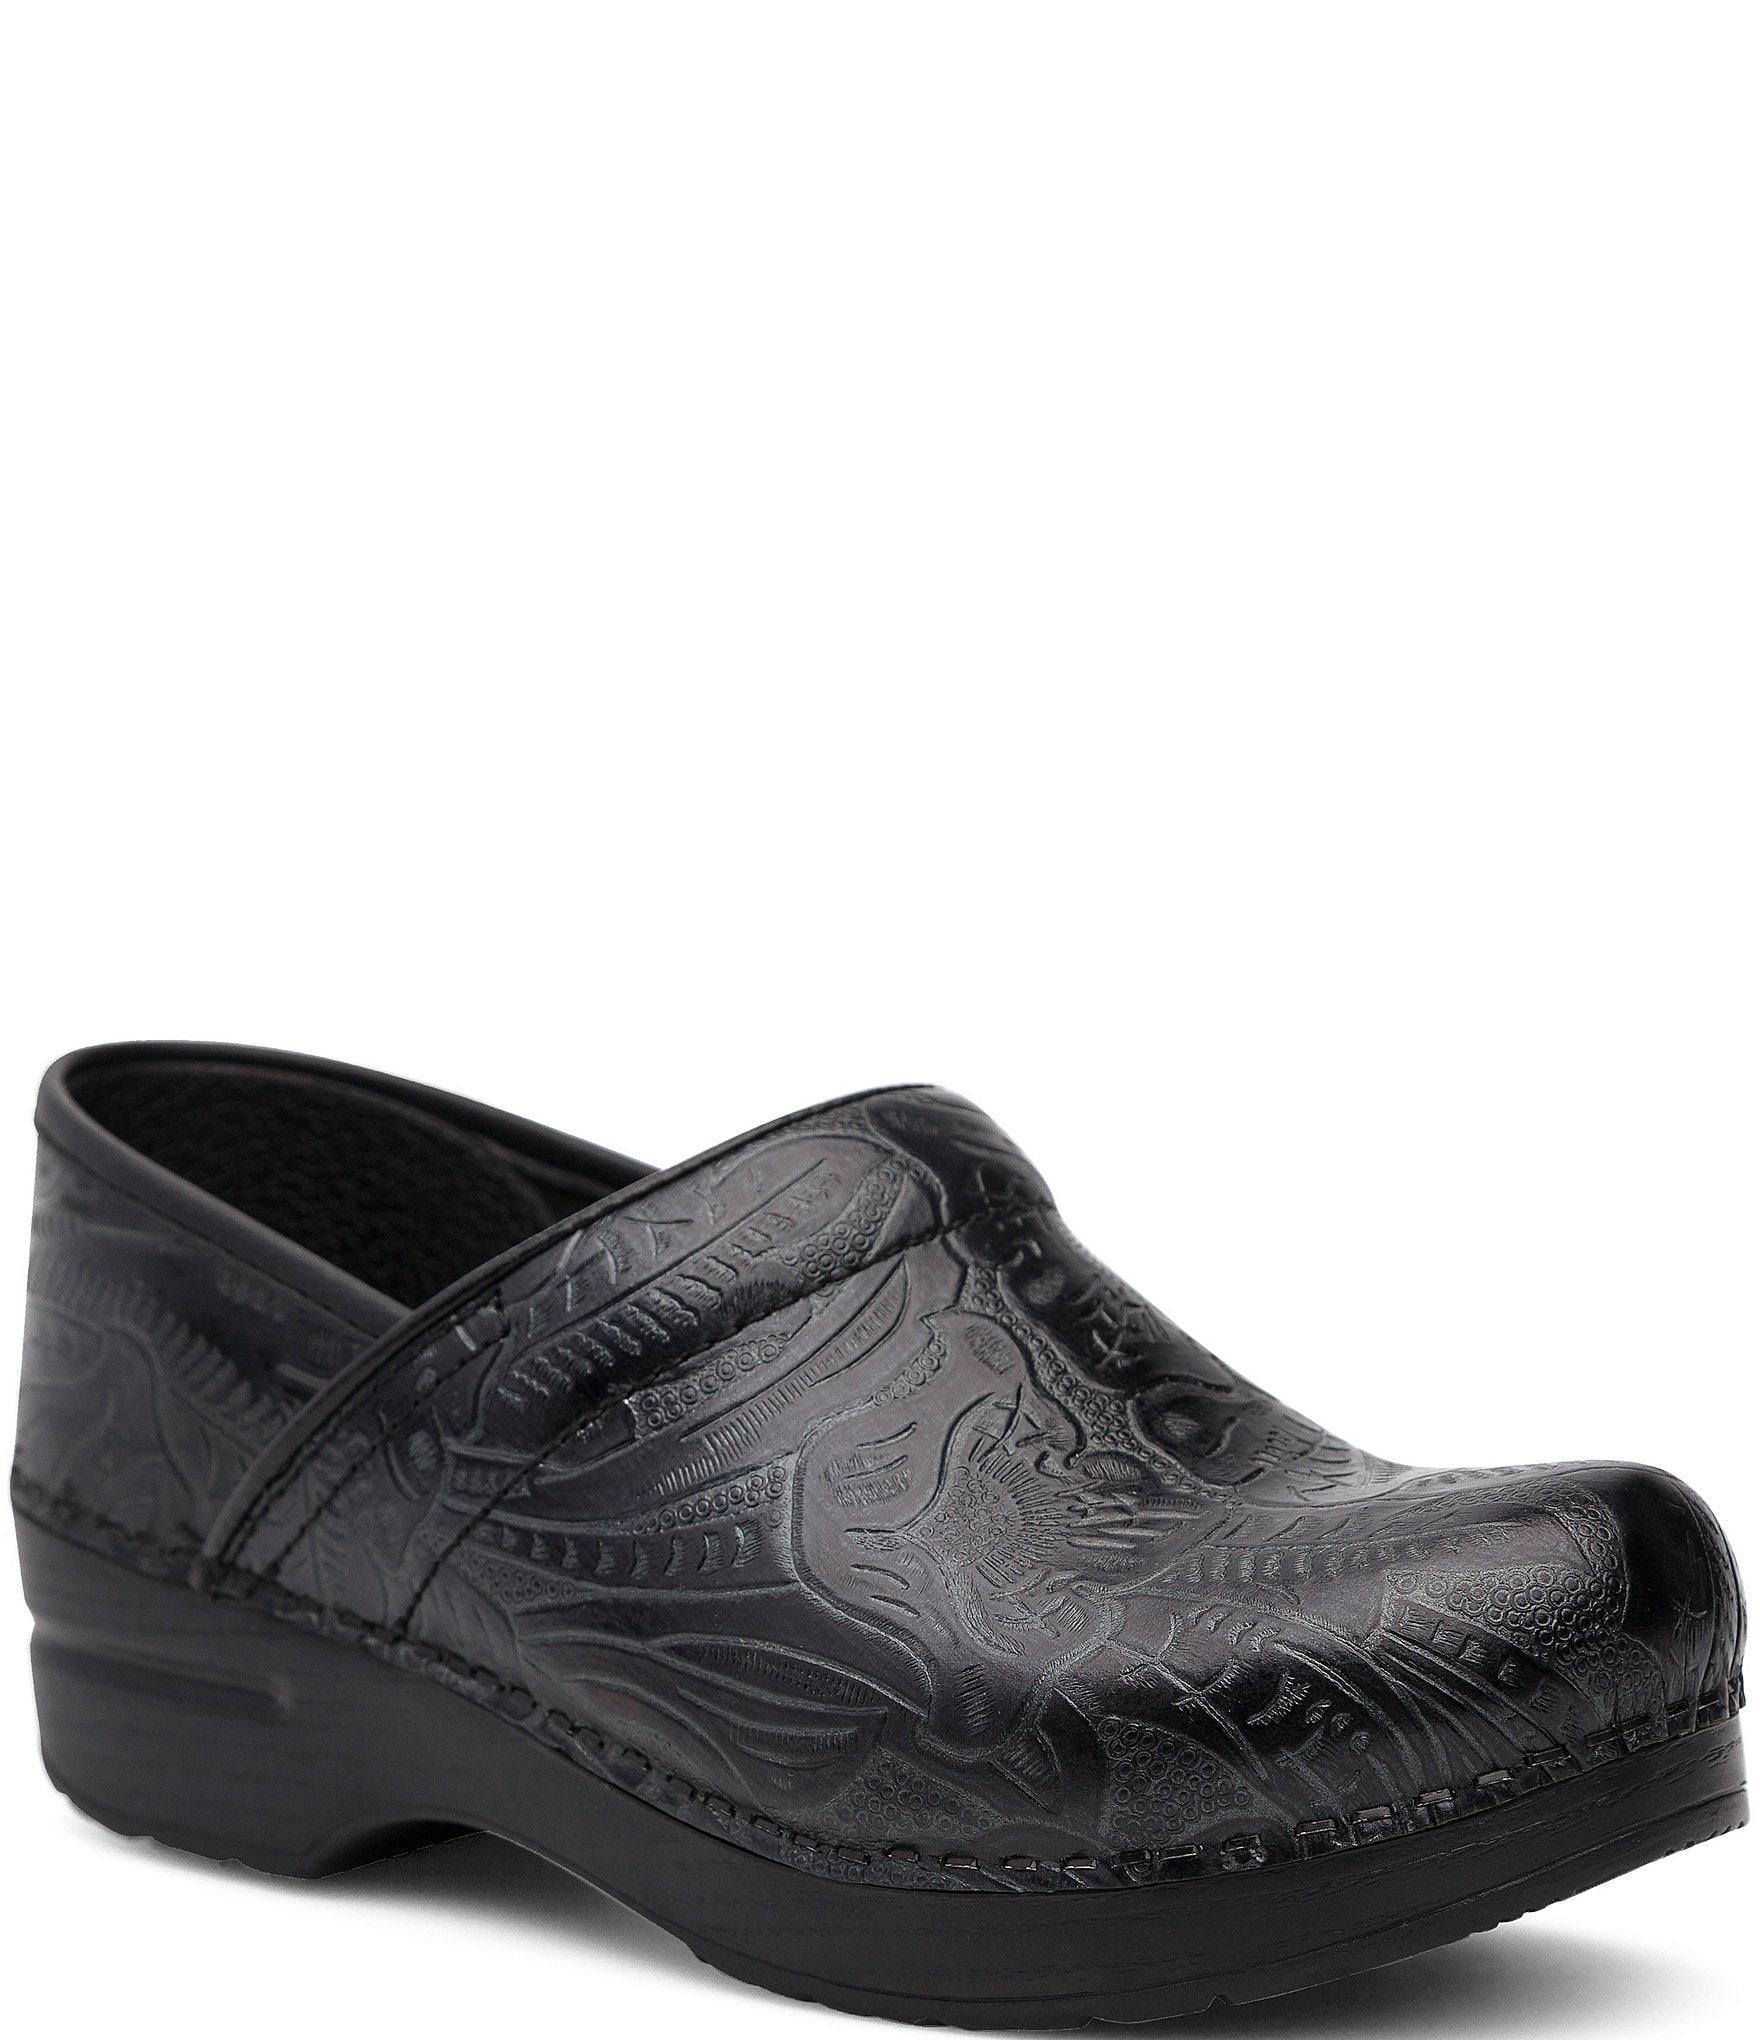 Dansko Shoes On Sale At Dillards